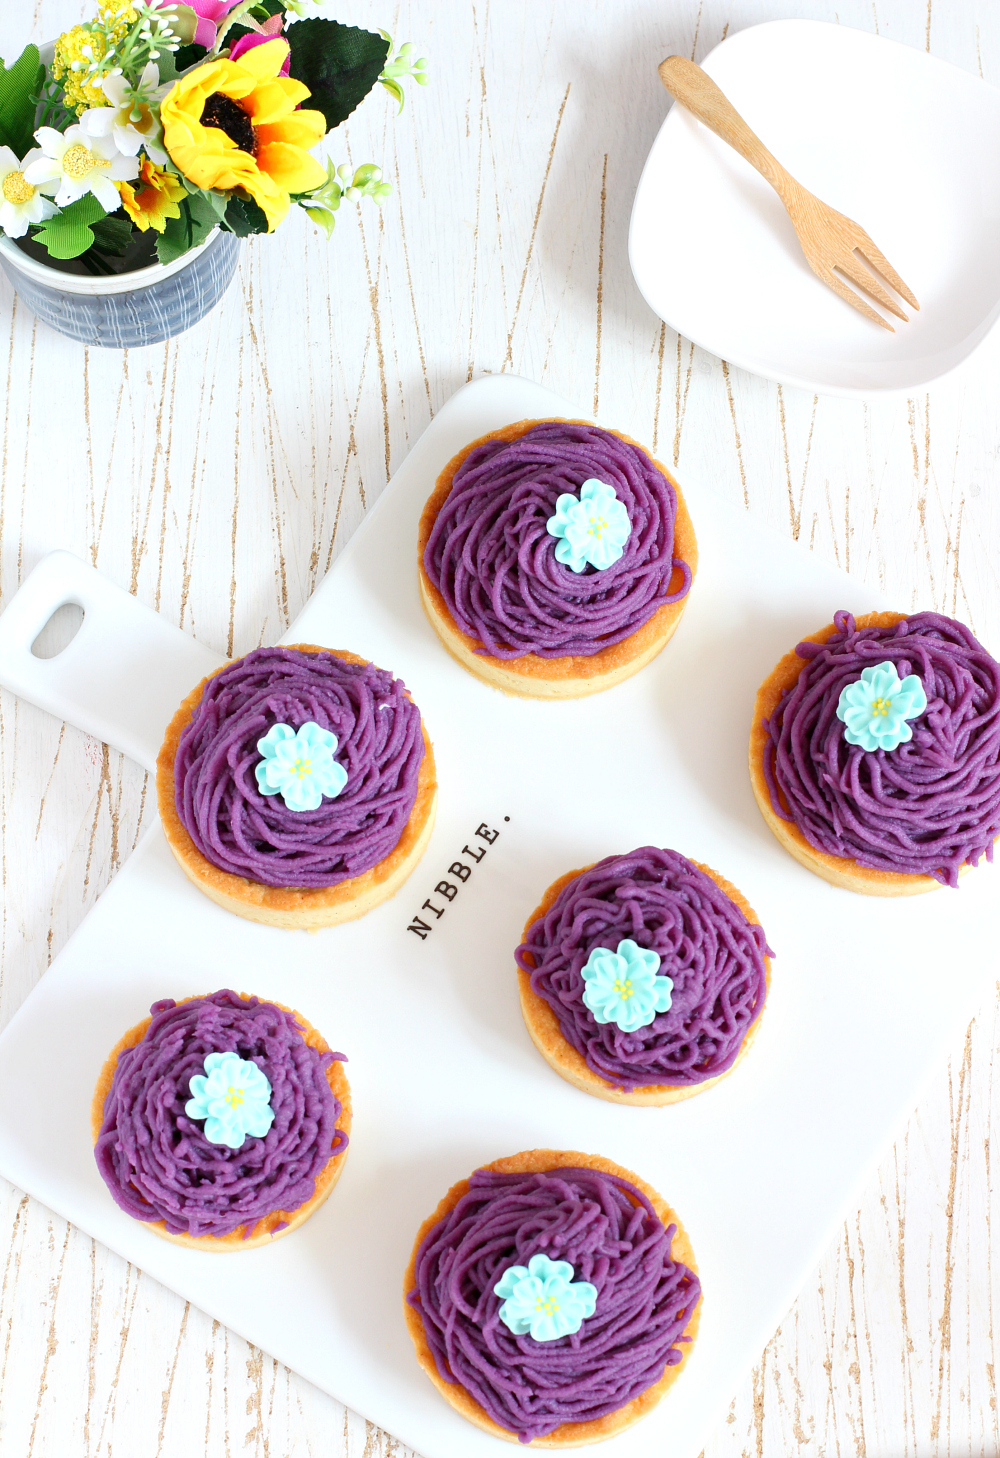 my bare cupboard: Purple sweet potato mont blanc tartlet